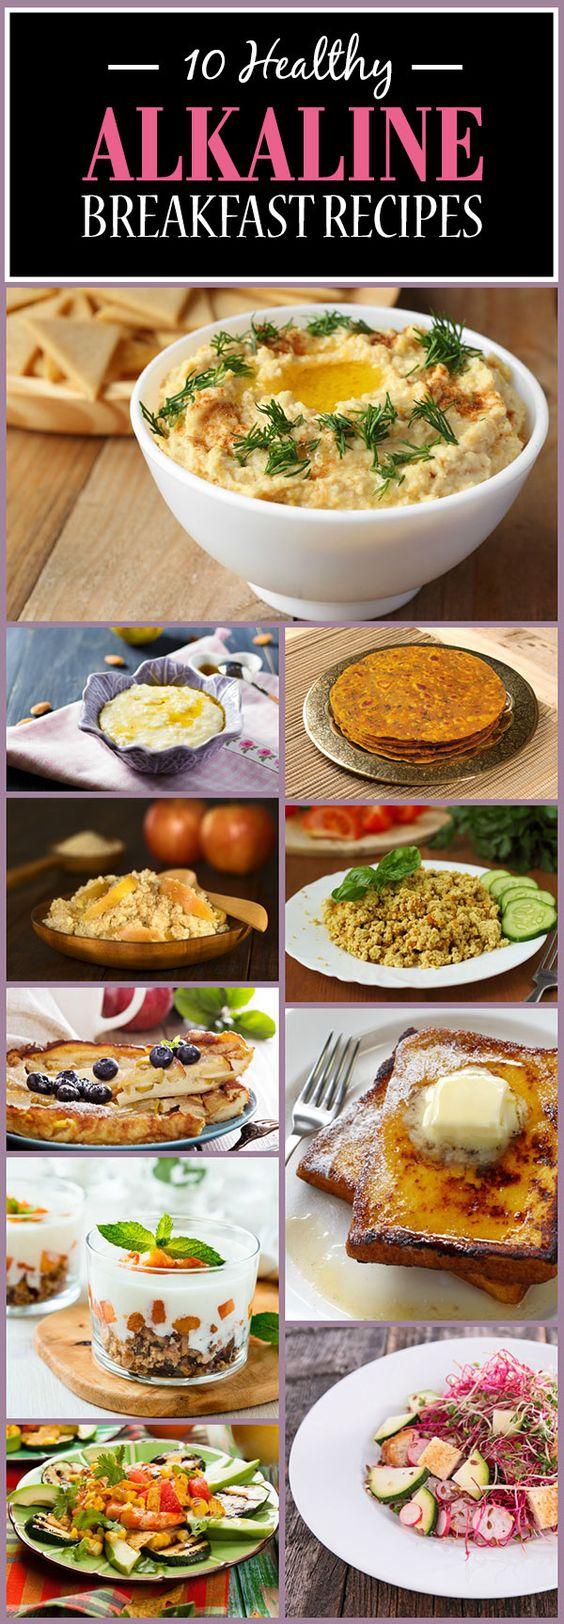 10 healthy alkaline breakfast recipes you must try alkaline 10 healthy alkaline breakfast recipes you must try alkaline breakfast health benefits and number forumfinder Gallery